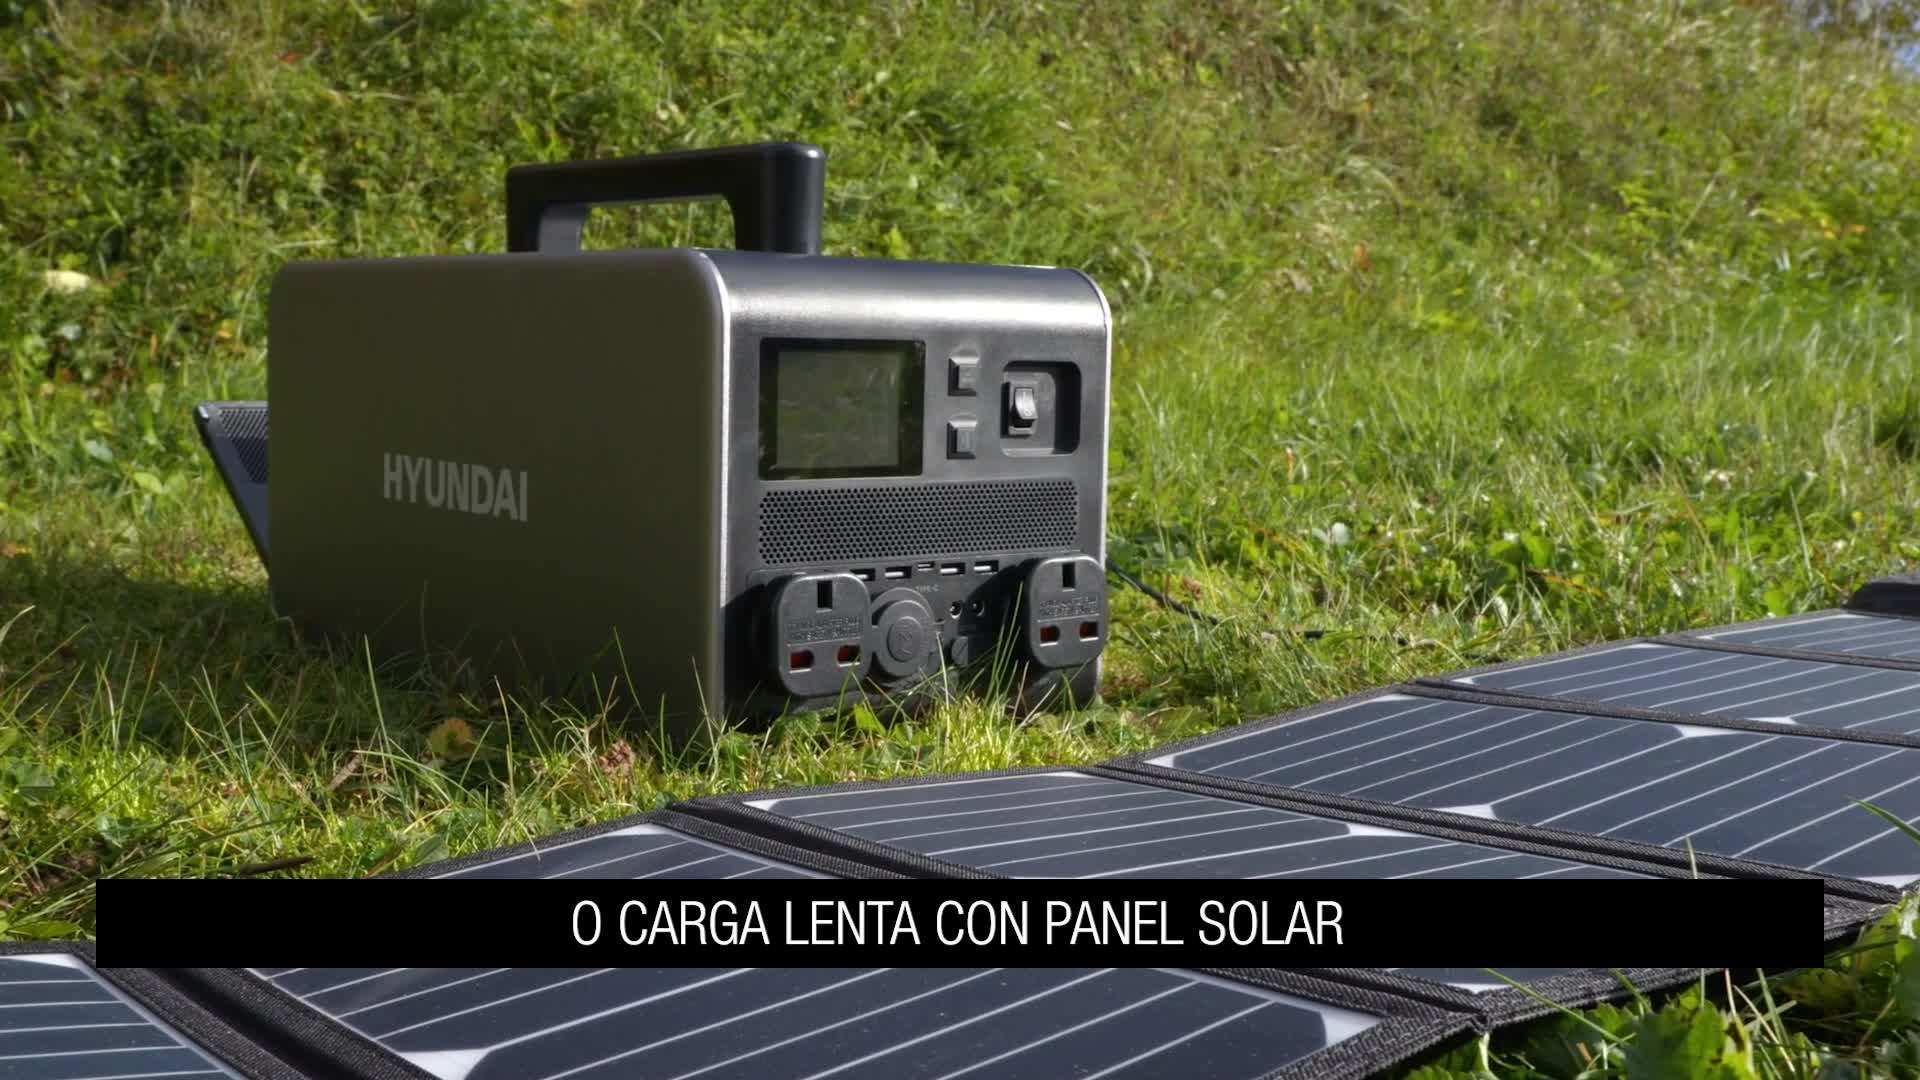 Hyundai HY-HPS1100 Generador Solar Portátil Recargable ...